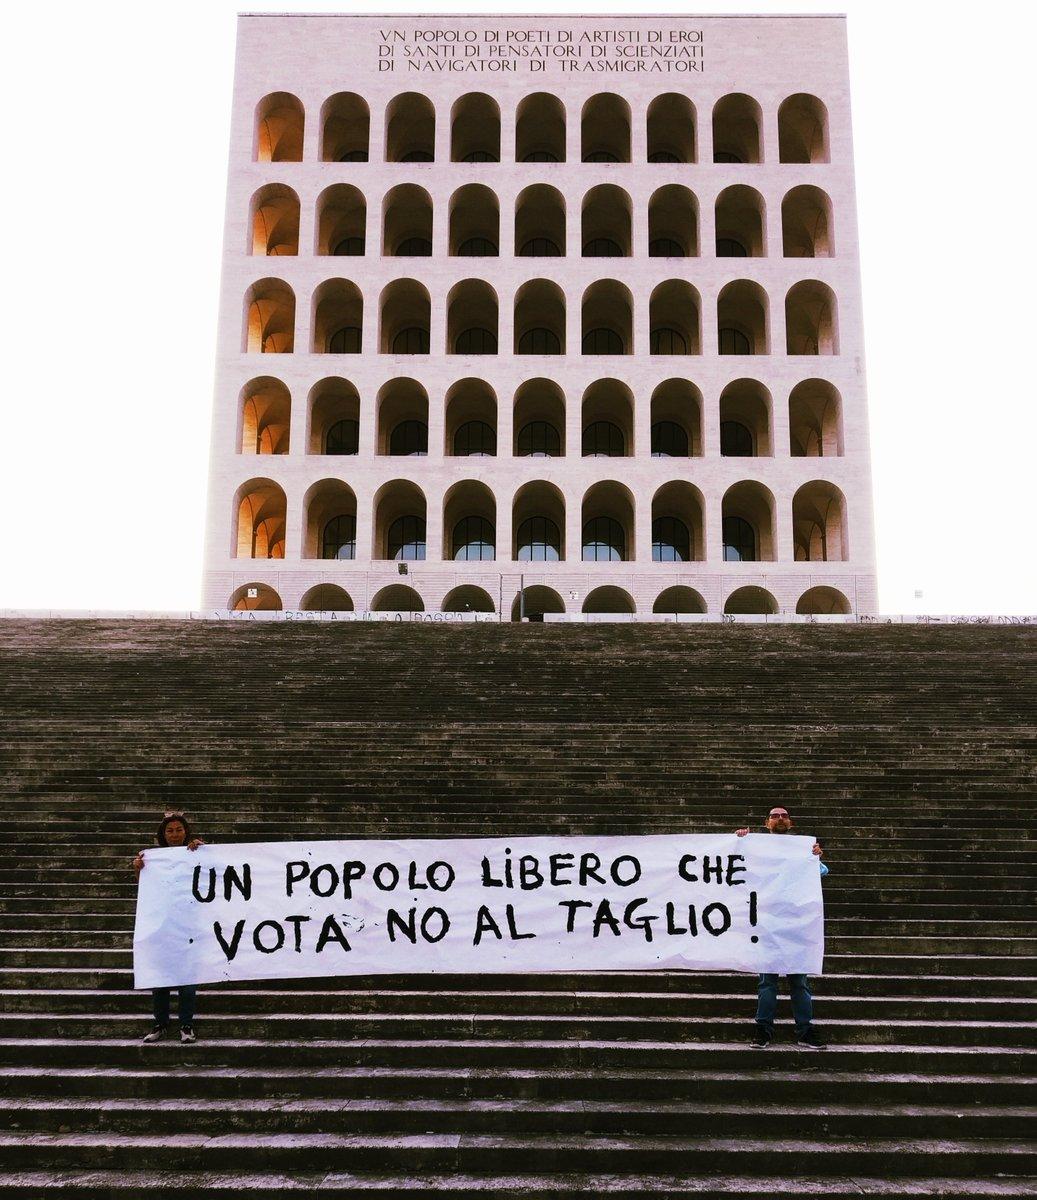 #UNITIperilNO